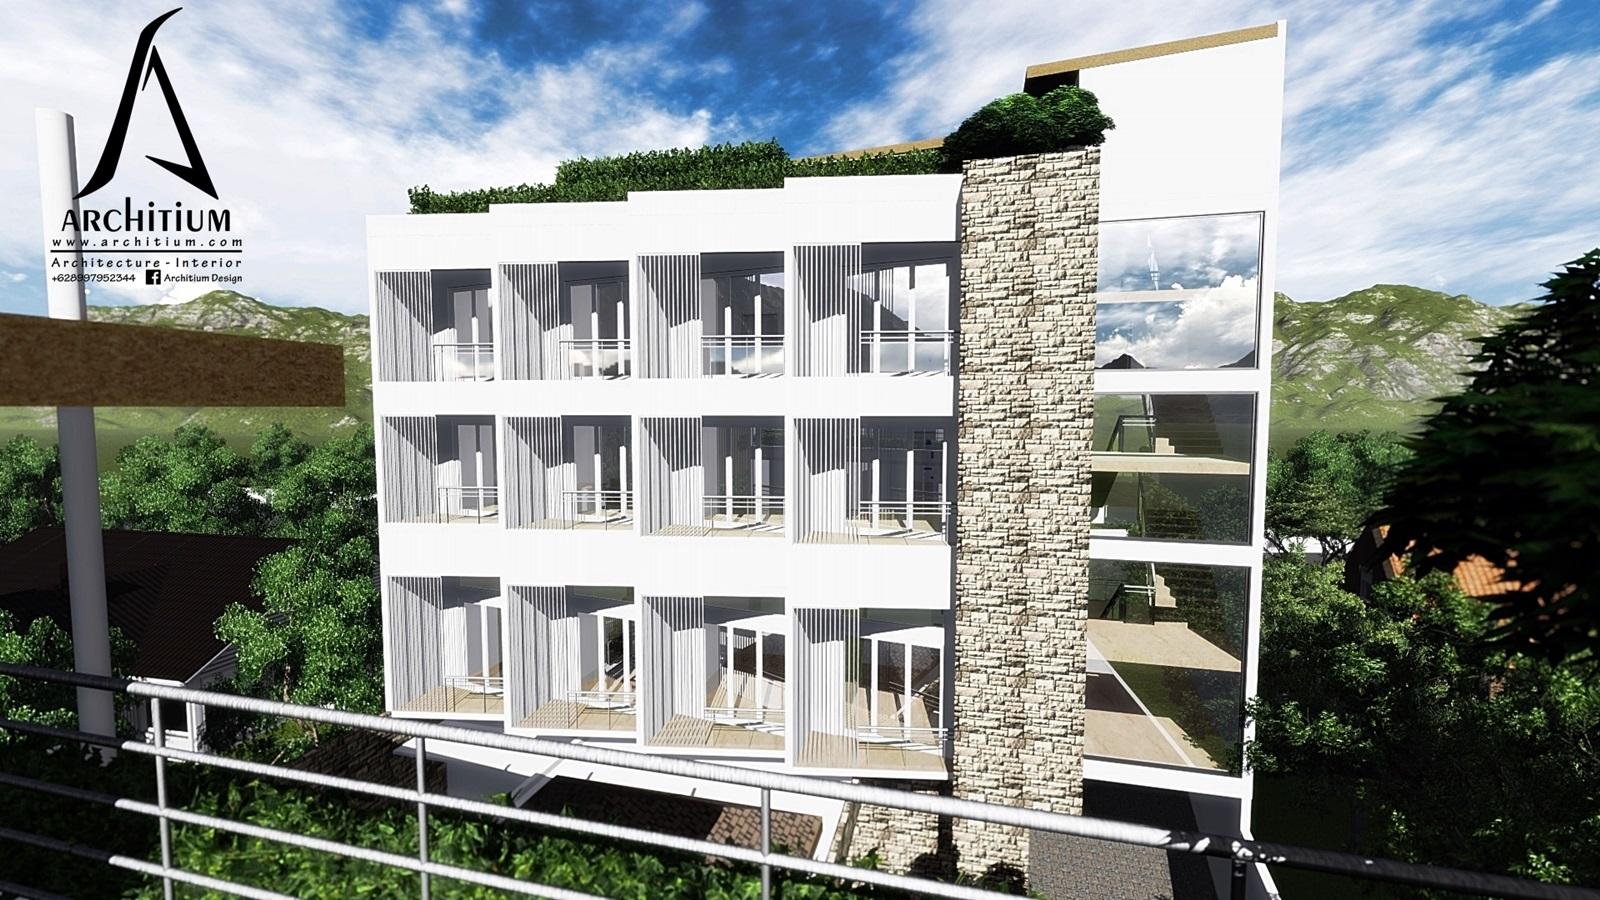 Architecture-Boarding House-Bandung-Back